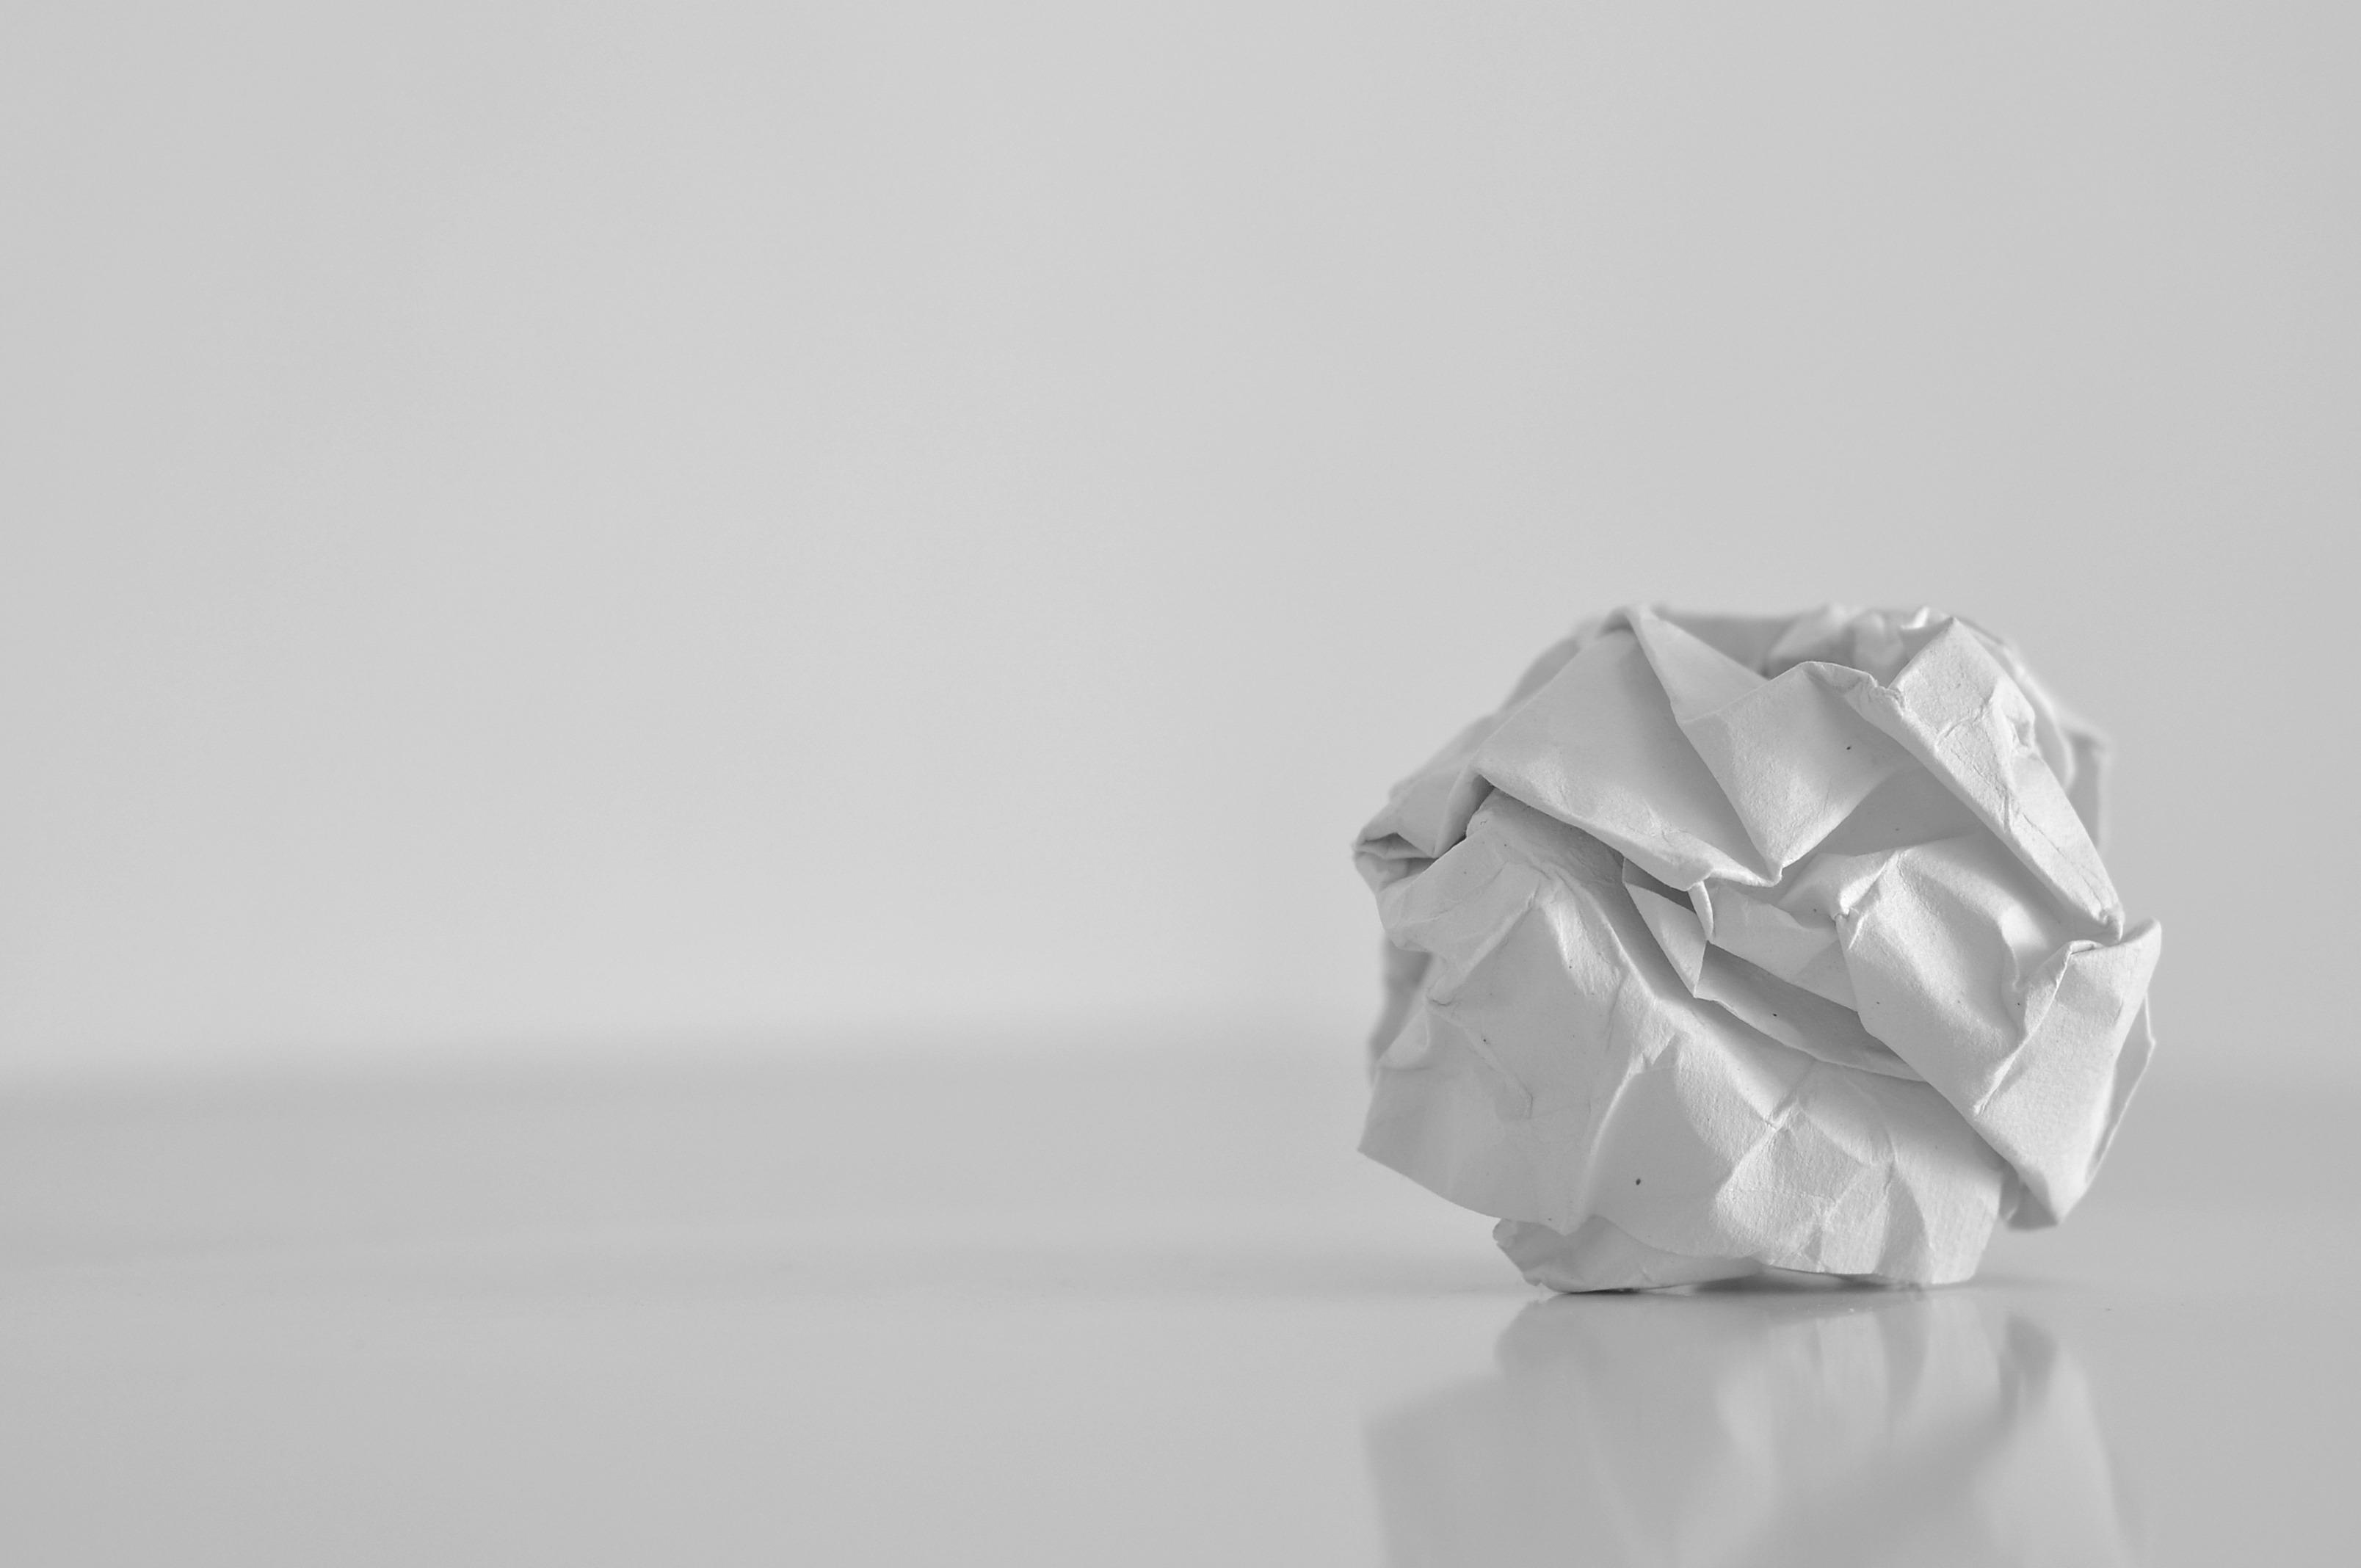 White paper card